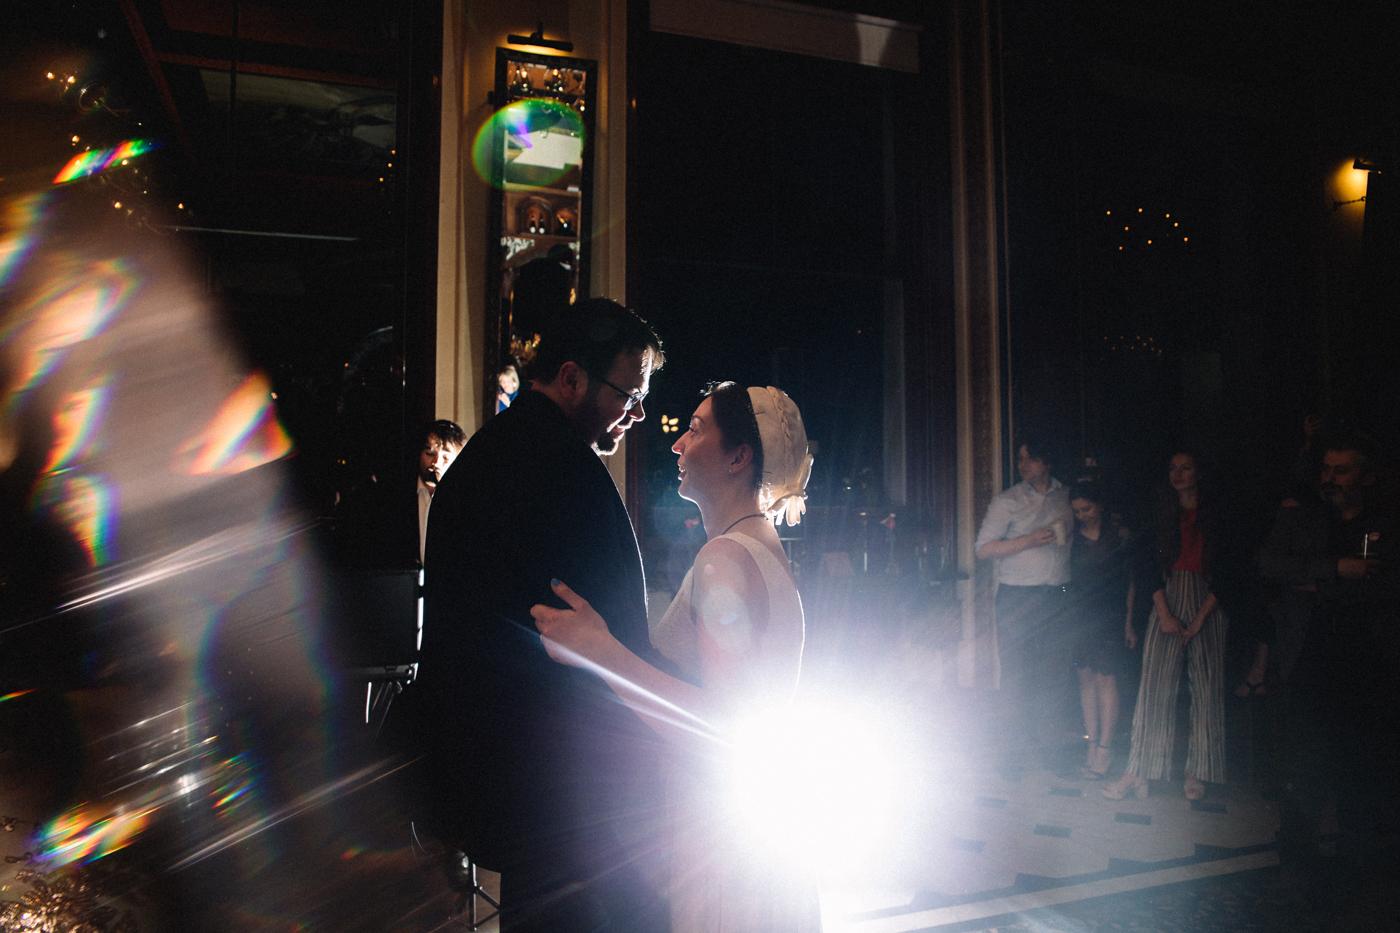 knights-templar-london-city-centre-wedding-photographer-charing-cross-creative-0039.jpg